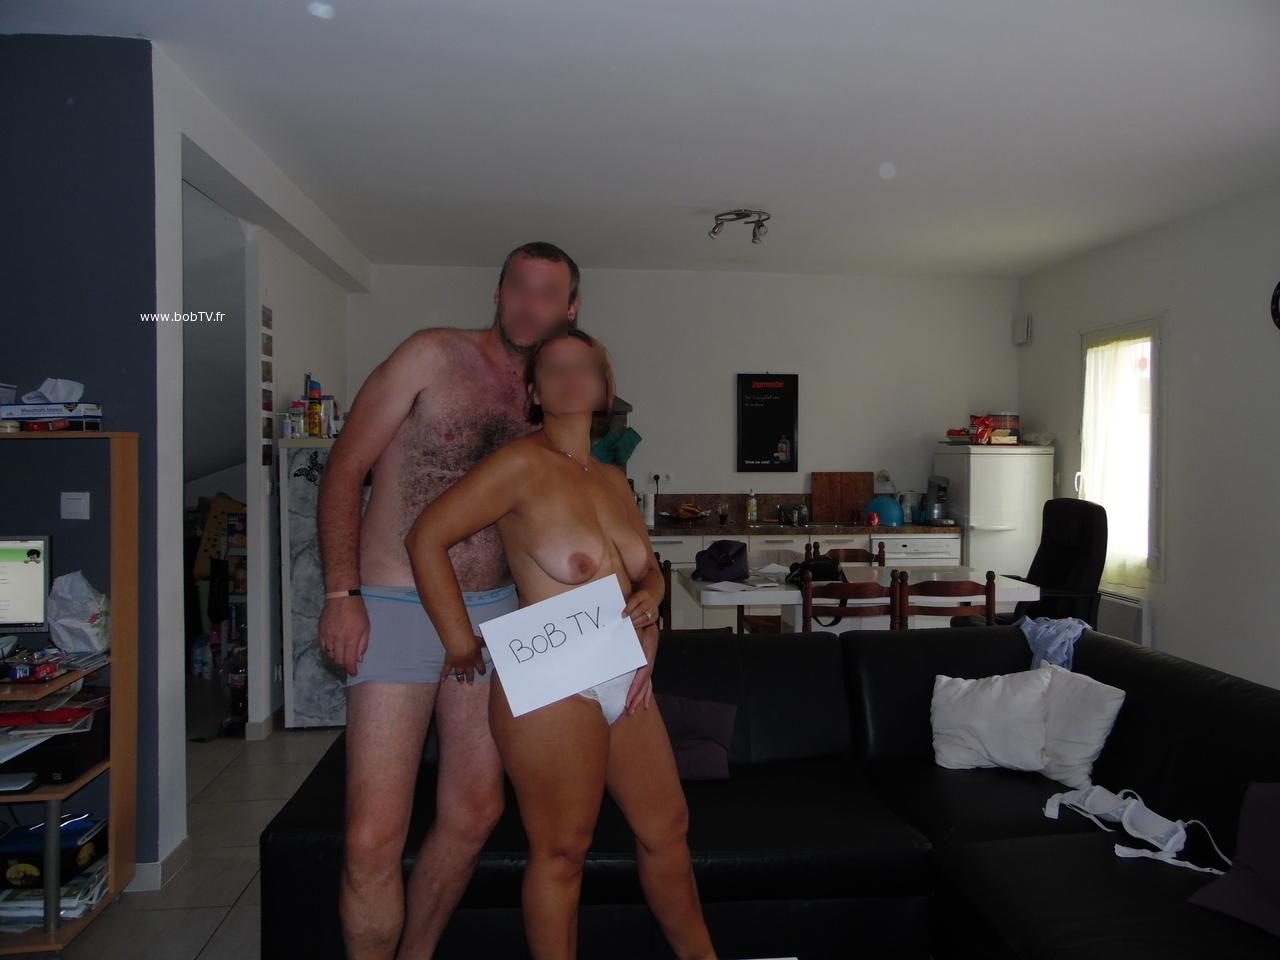 exhib gay cam gay rhone alpes